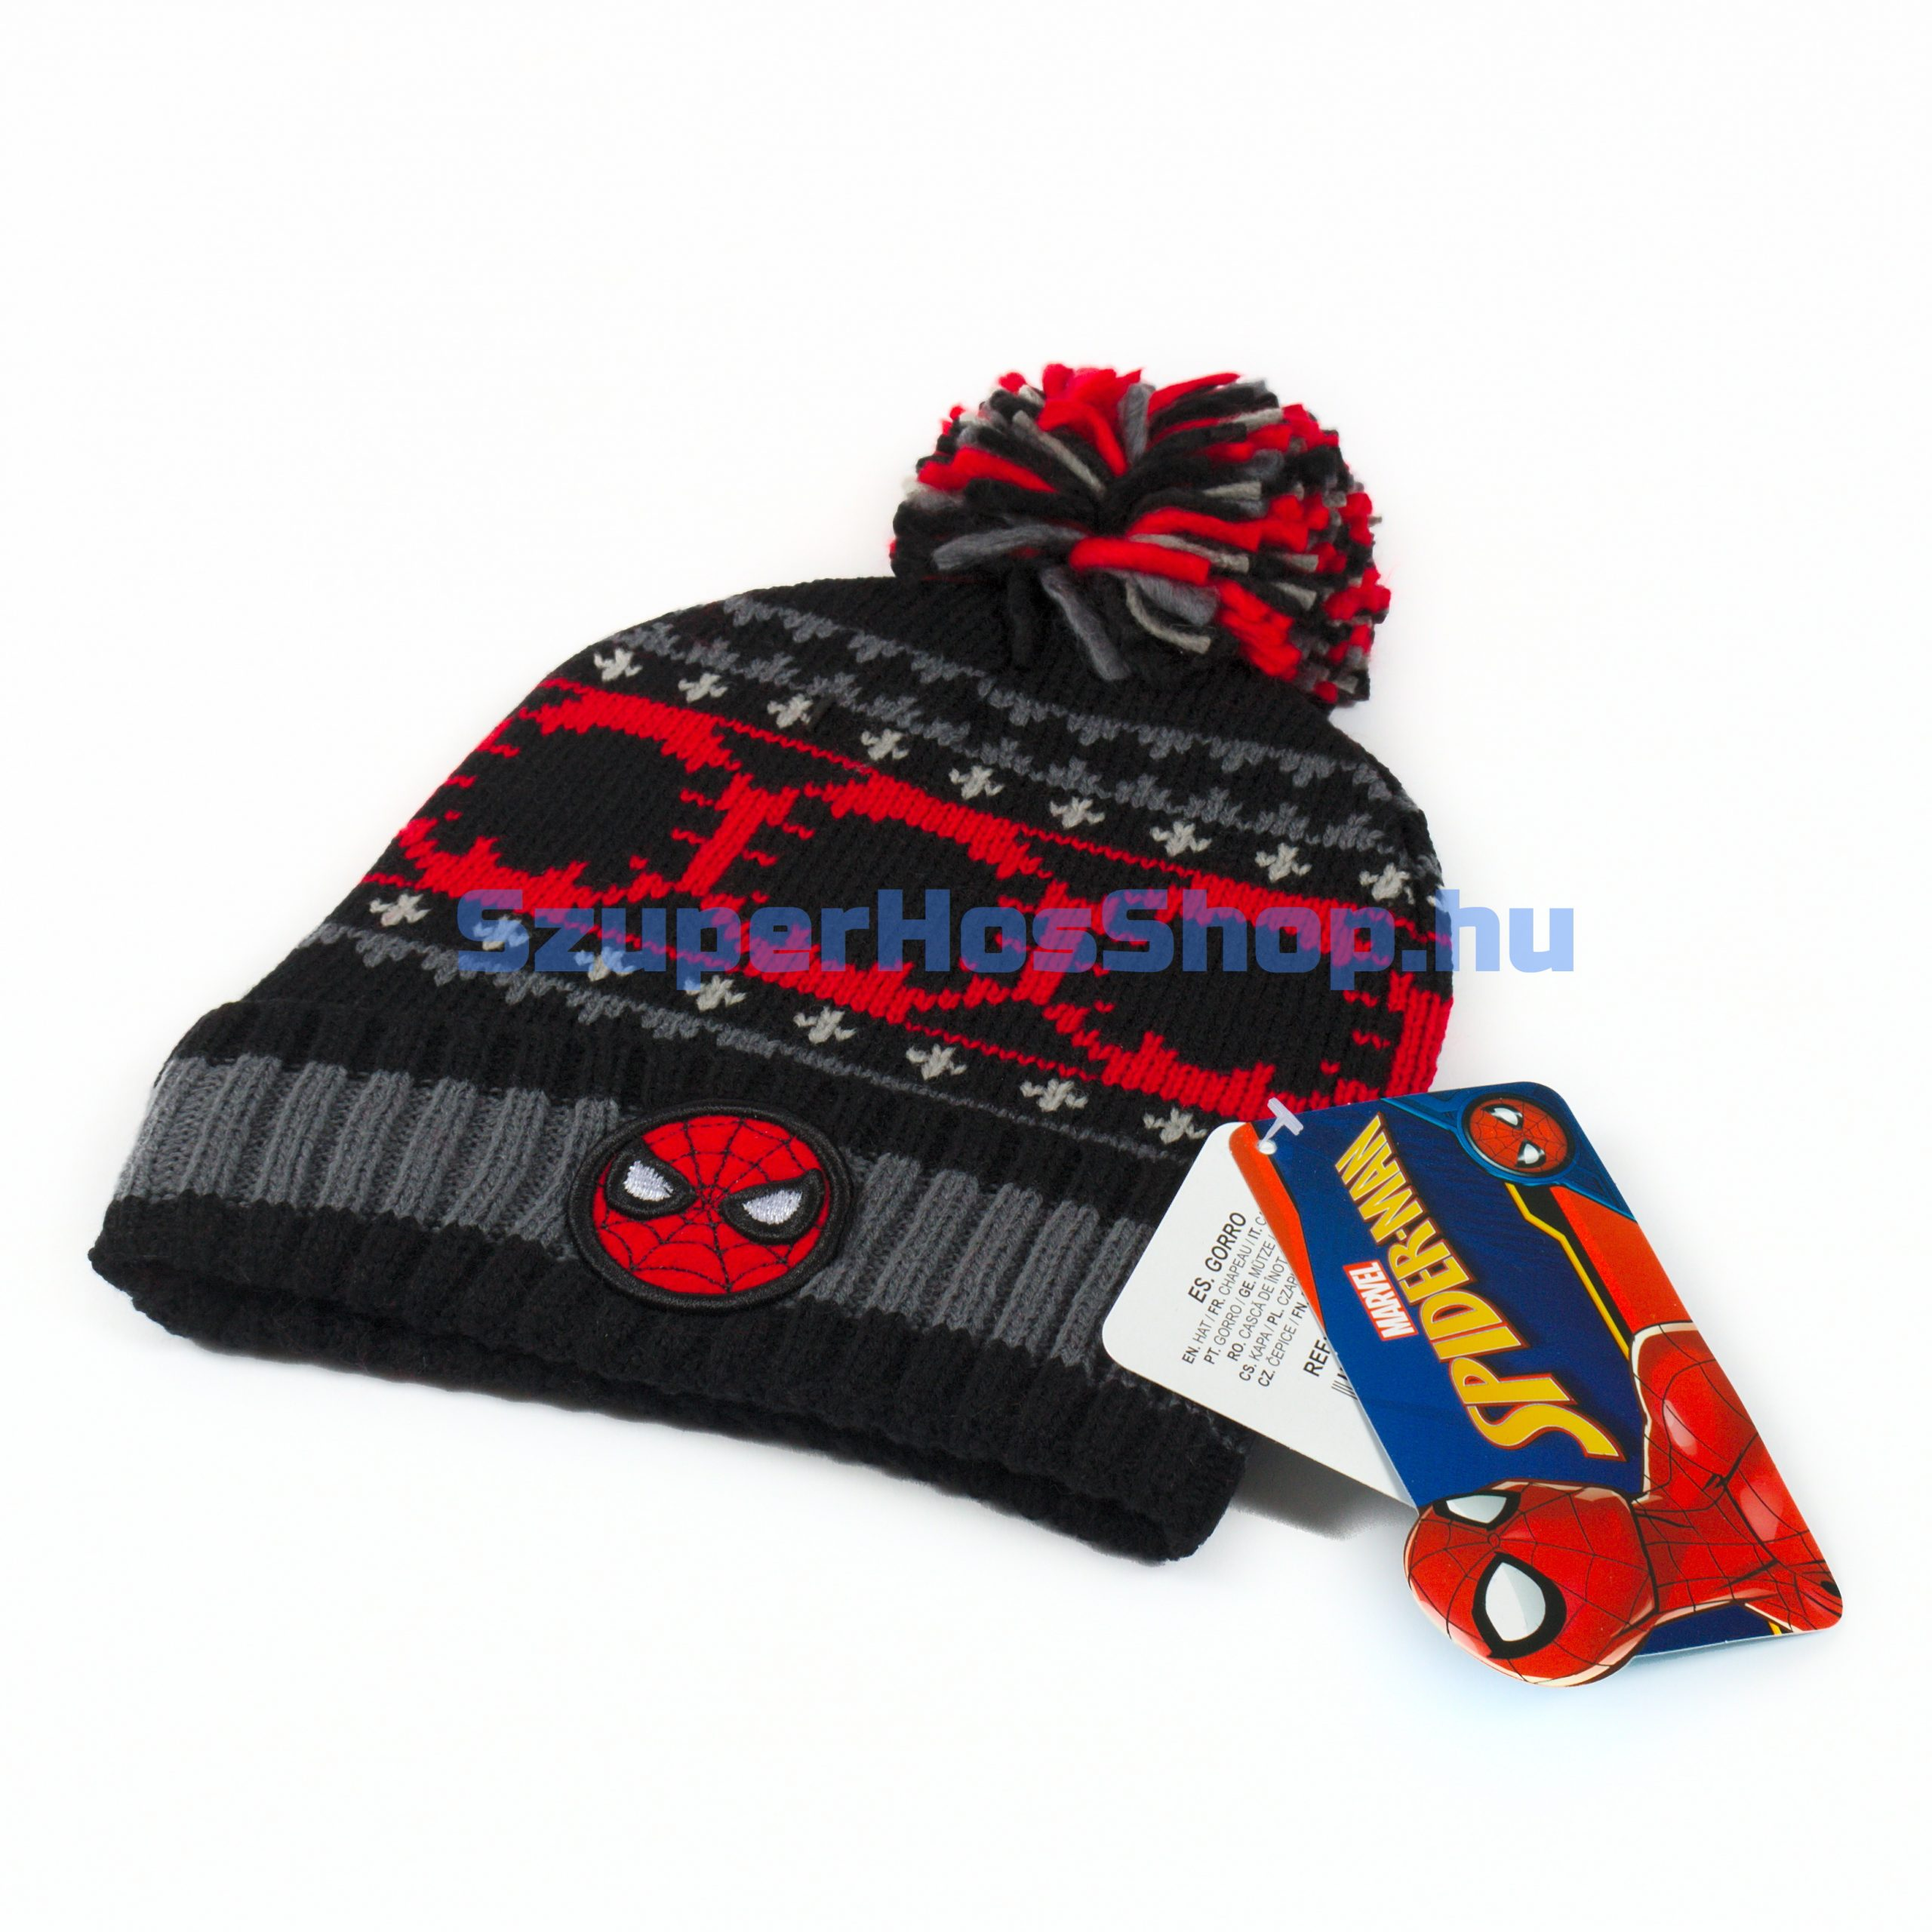 Pókember sapka (Spiderman)